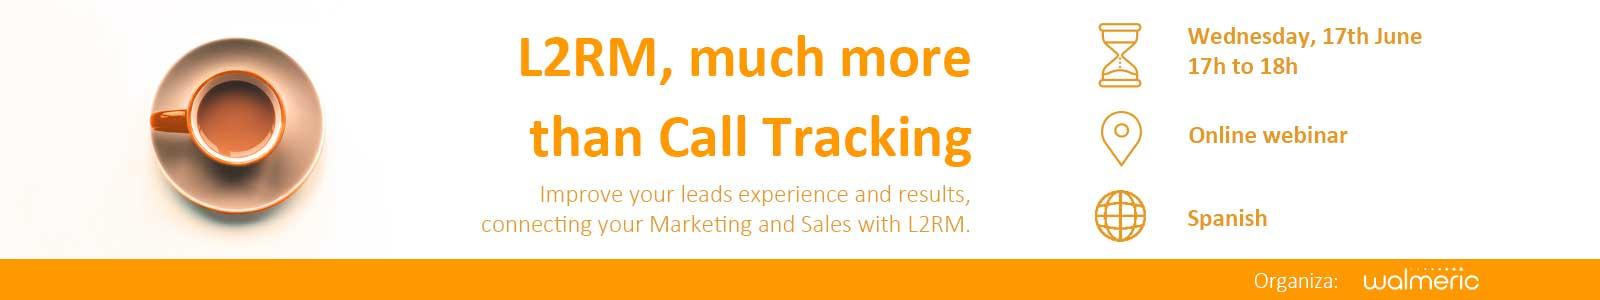 Banner-webinar-Call-Tracking-L2RM---ENG